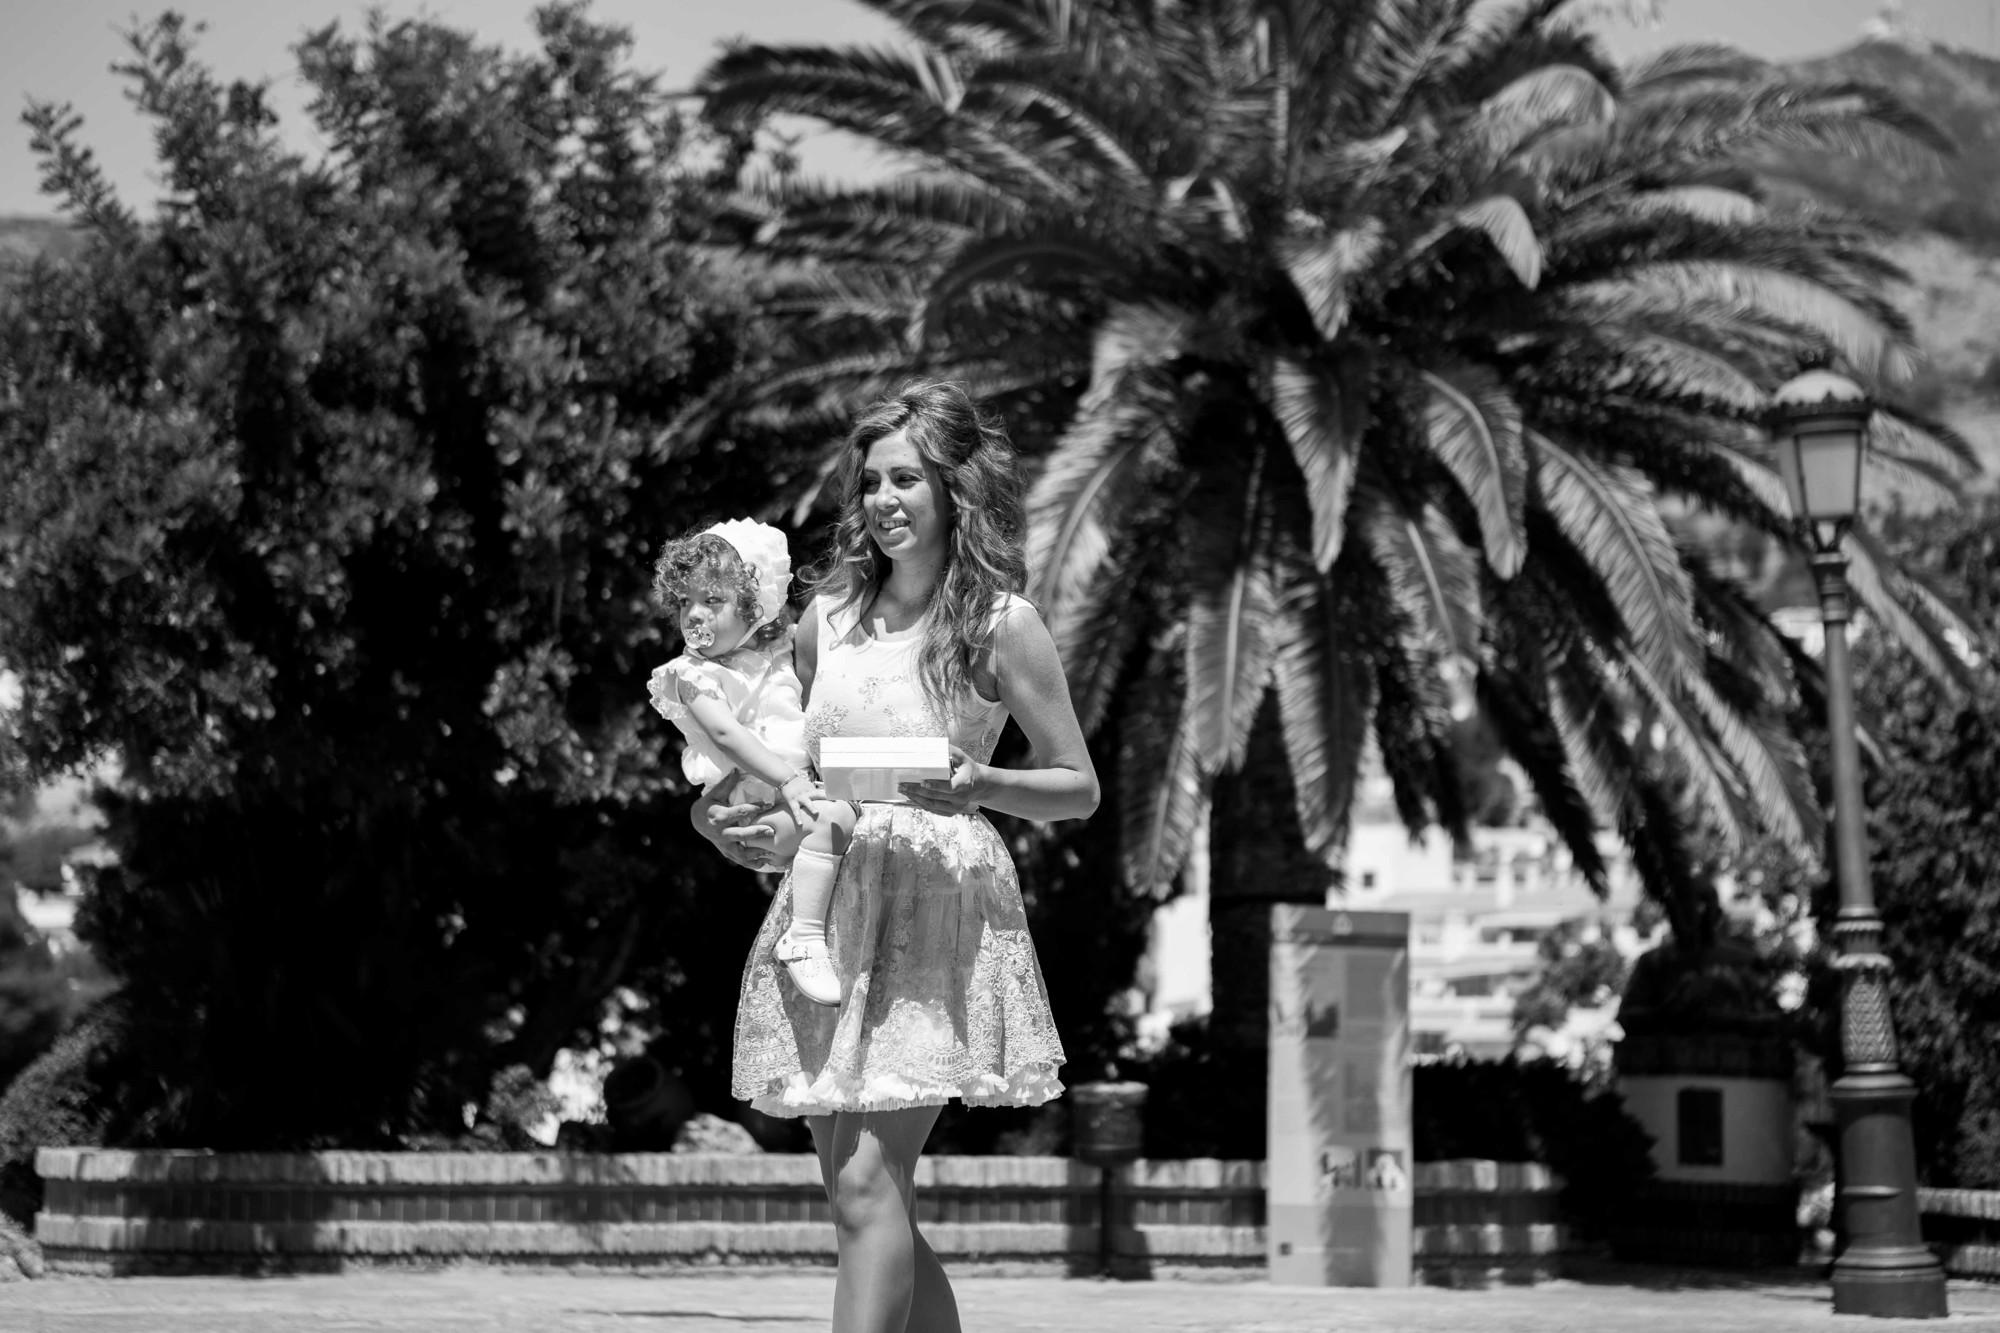 fotógrafos de niños Málaga, repotaje de bautizo malaga-40